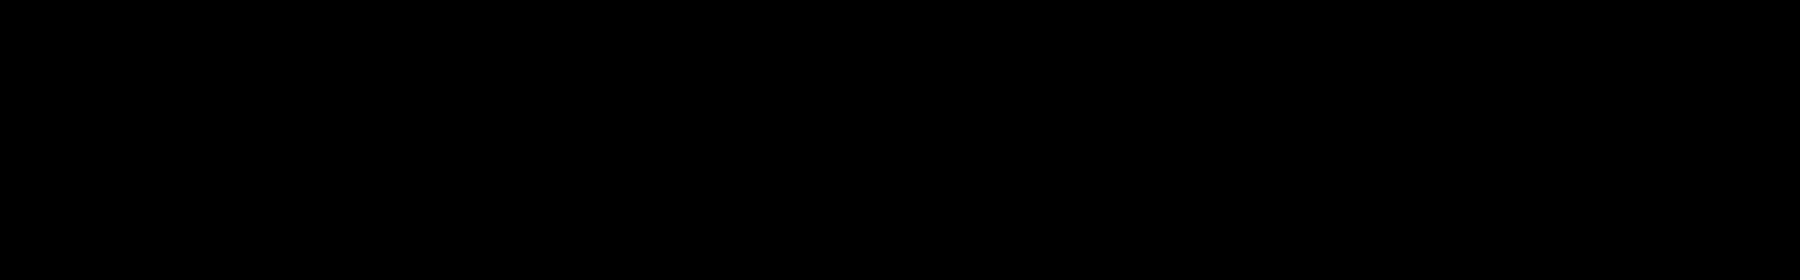 The Kraken Vol 1 - Dubstep Serum Presets audio waveform